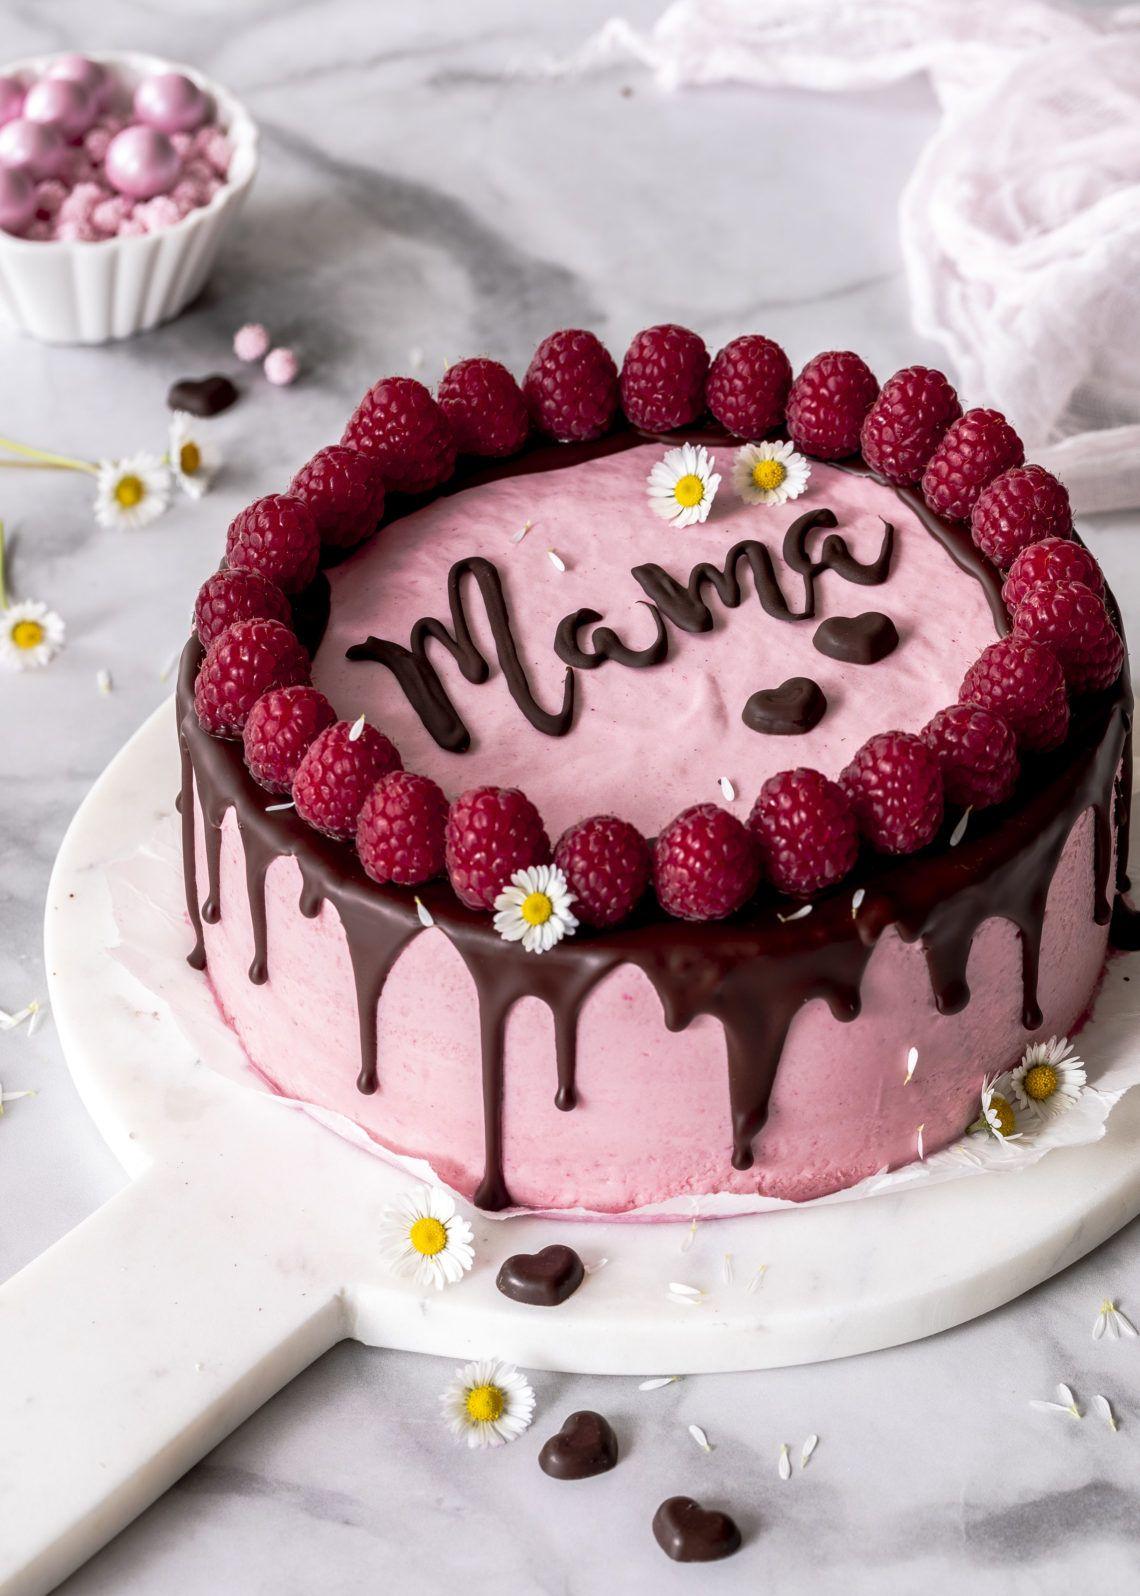 Rezept Himbeermousse Torte mit Schokolade und Schriftzug zum Muttertag backen Drip Cake Cakelettering muttertag cakelettering dripcake torte cake mothersday himbeeren   Emma´s Lieblingsstück is part of Cake -